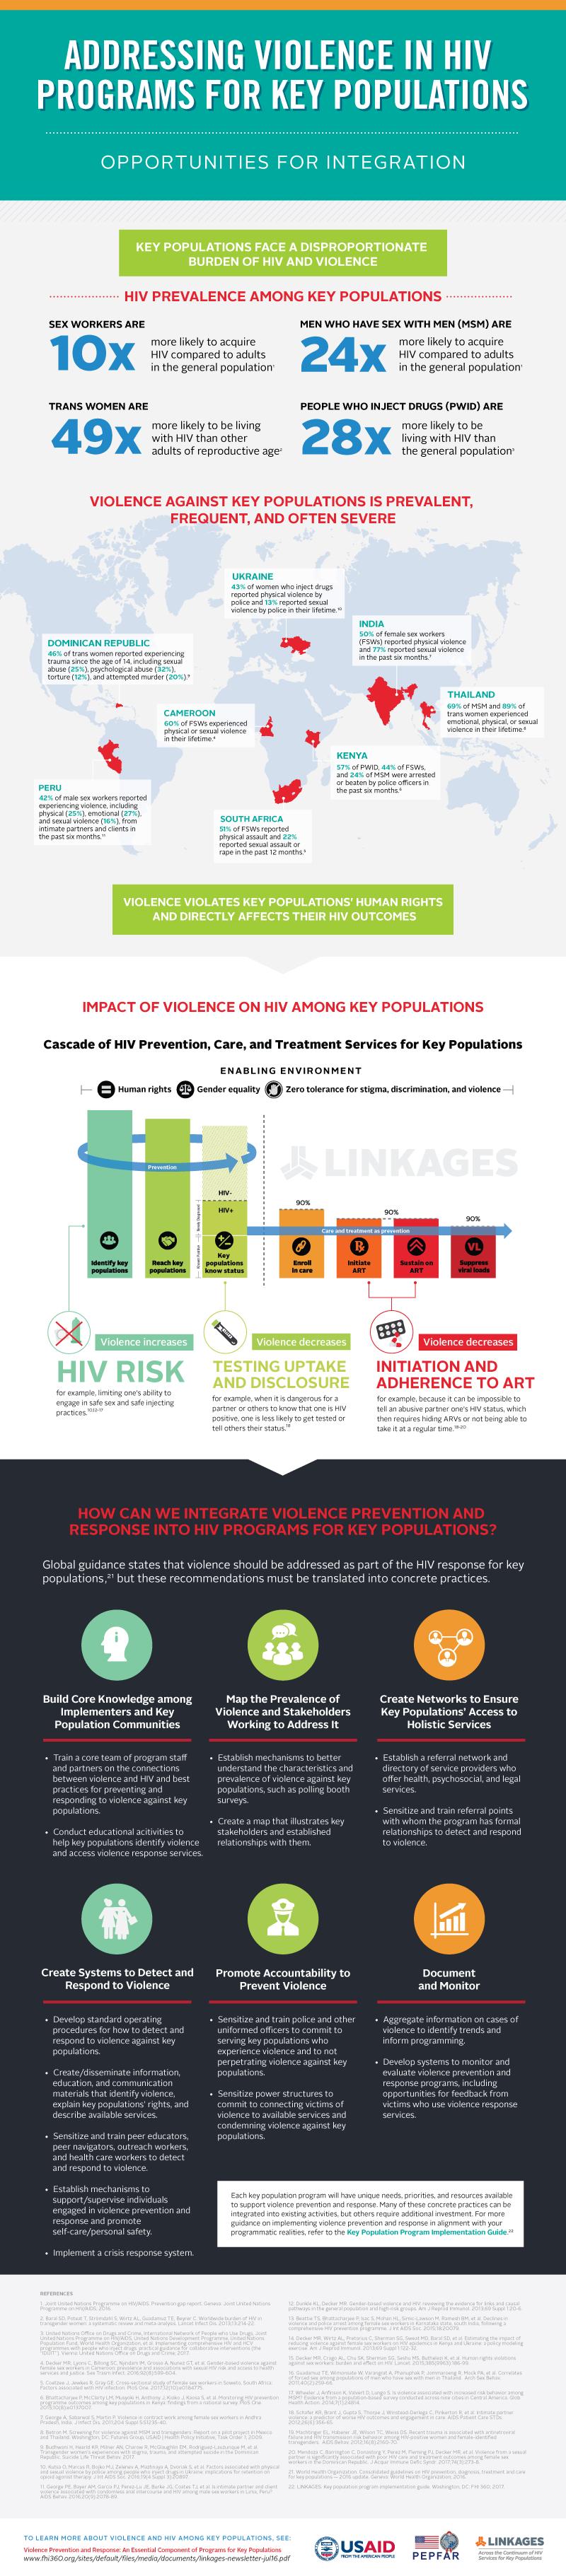 GPV-HIV-infographic-FINAL